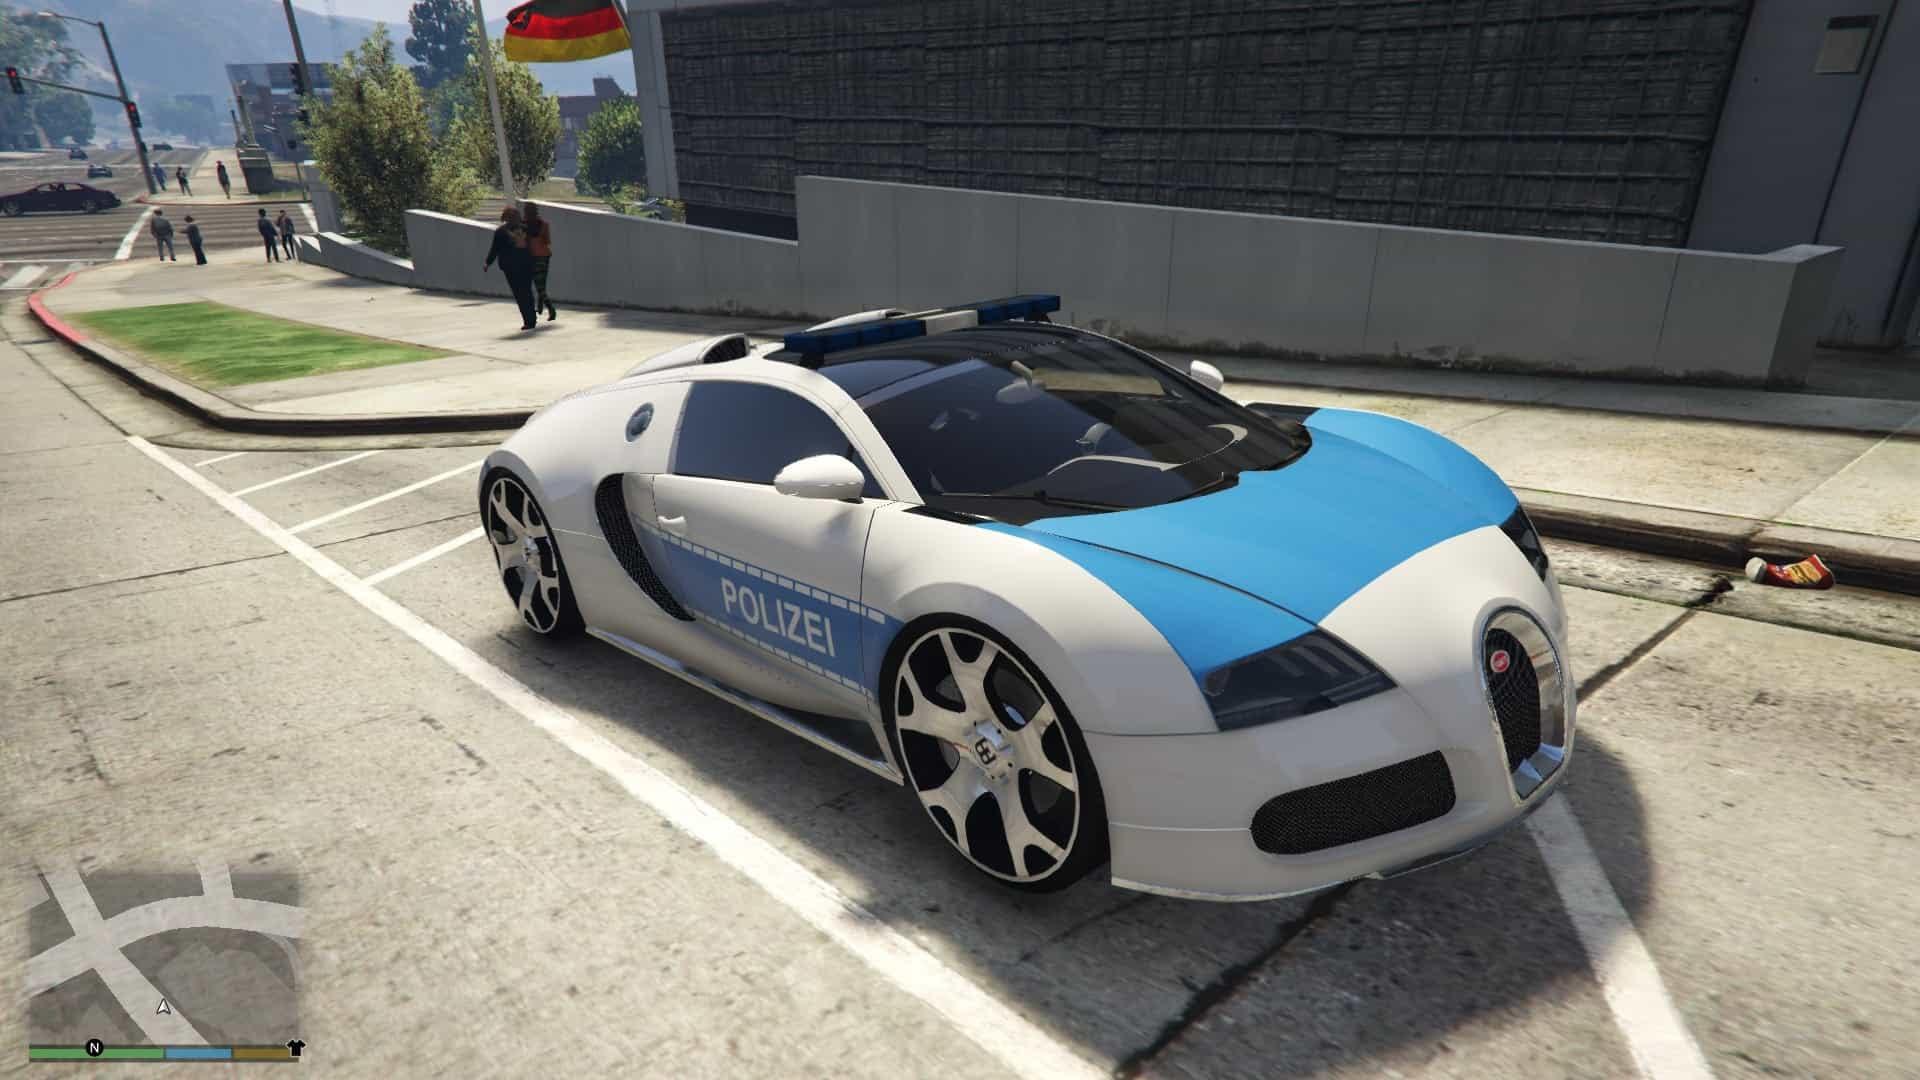 Bugatti Veyron Polizei-Lackierung 1.0 - GTA 5 Mod | Grand Theft Auto 5 Mod